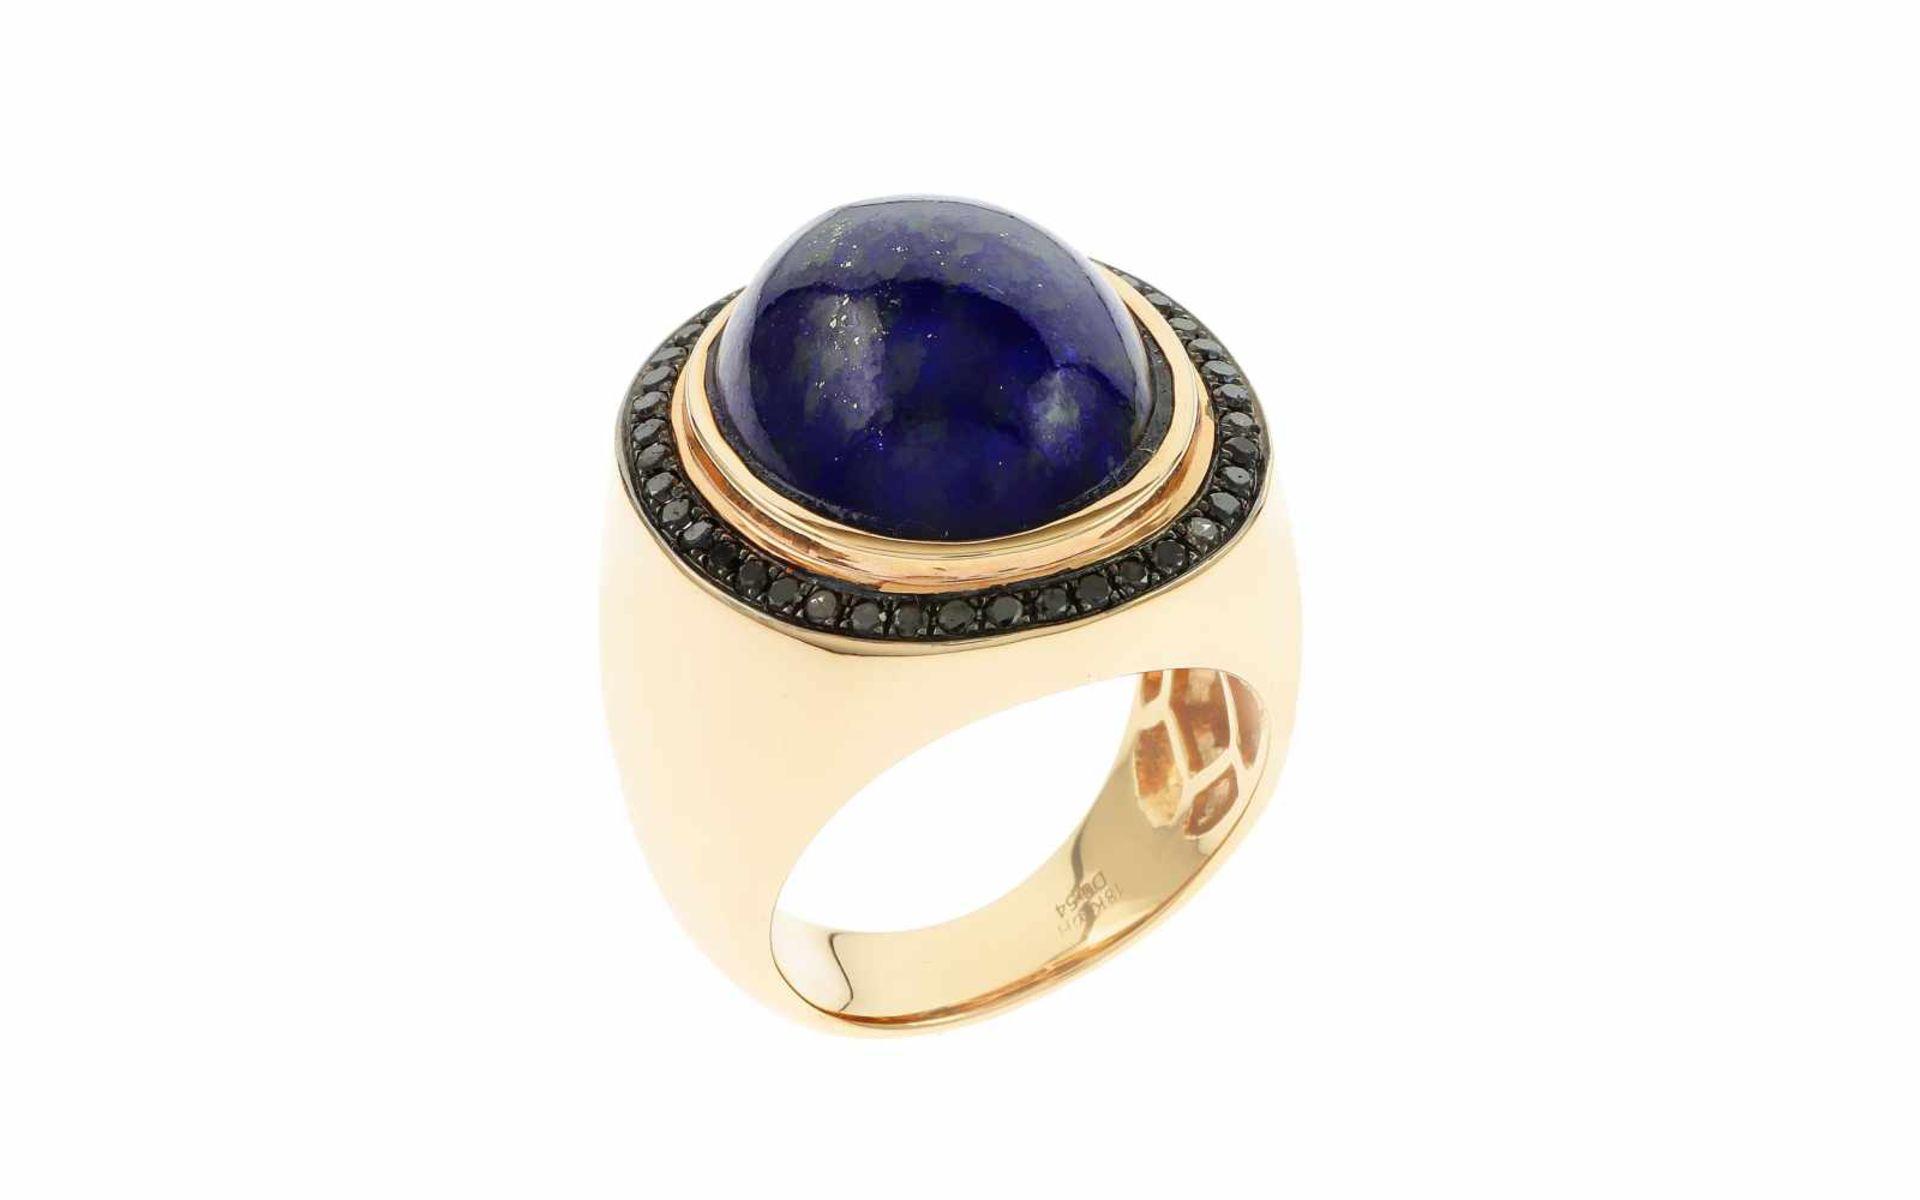 Lapislazuliring Ring 18K RG mit 0,54 ct schwarzen Diamanten und Lapislazuli oval Cabochon 16,15